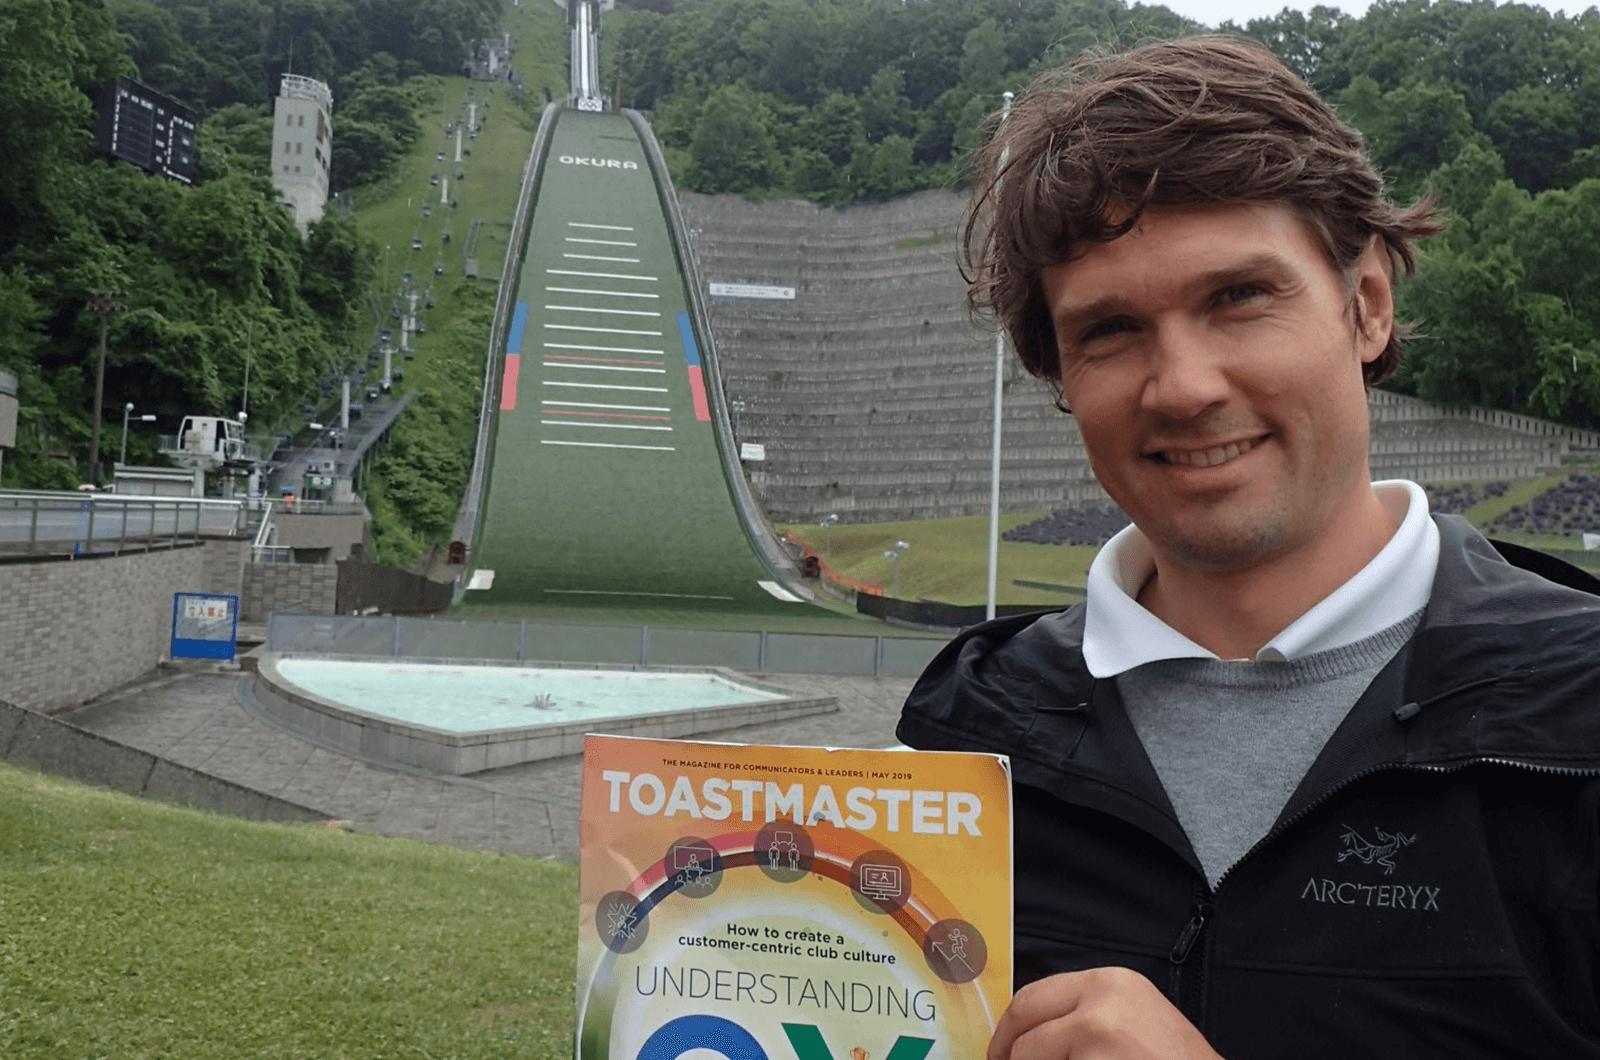 Christoph Elmer of Salzburg, Austria, visits the Okurayama Ski Jump Stadium in Sapporo, Japan. The Okurayama stadium has hosted a number of winter sports events, including the 1972 Winter Olympics and the 2007 FIS Nordic World Ski Championships.